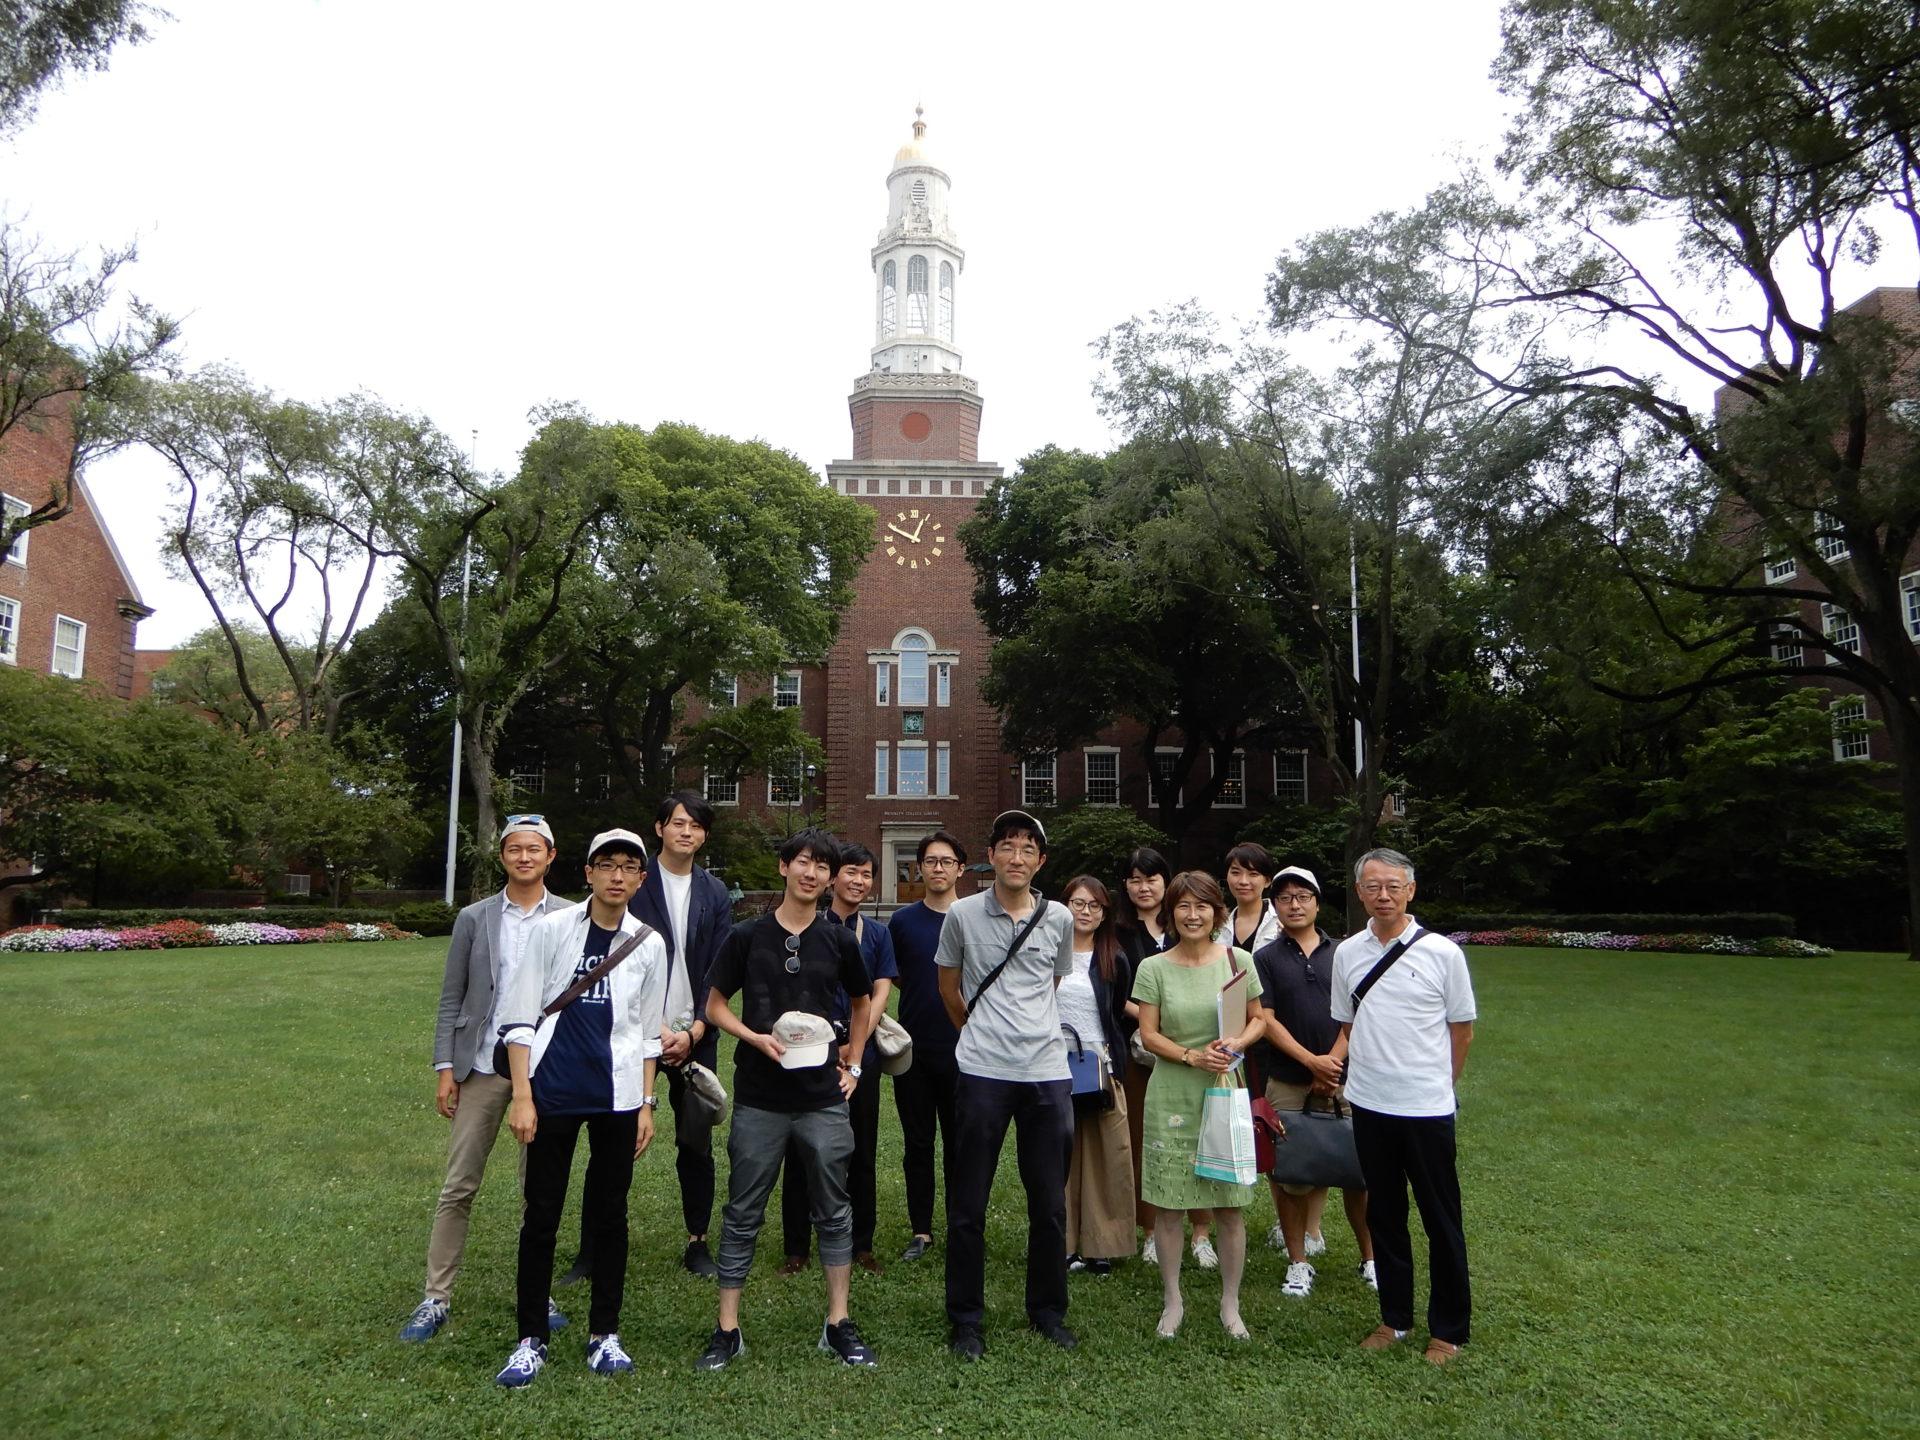 2018年度 ニューヨーク国際研修プロジェクト